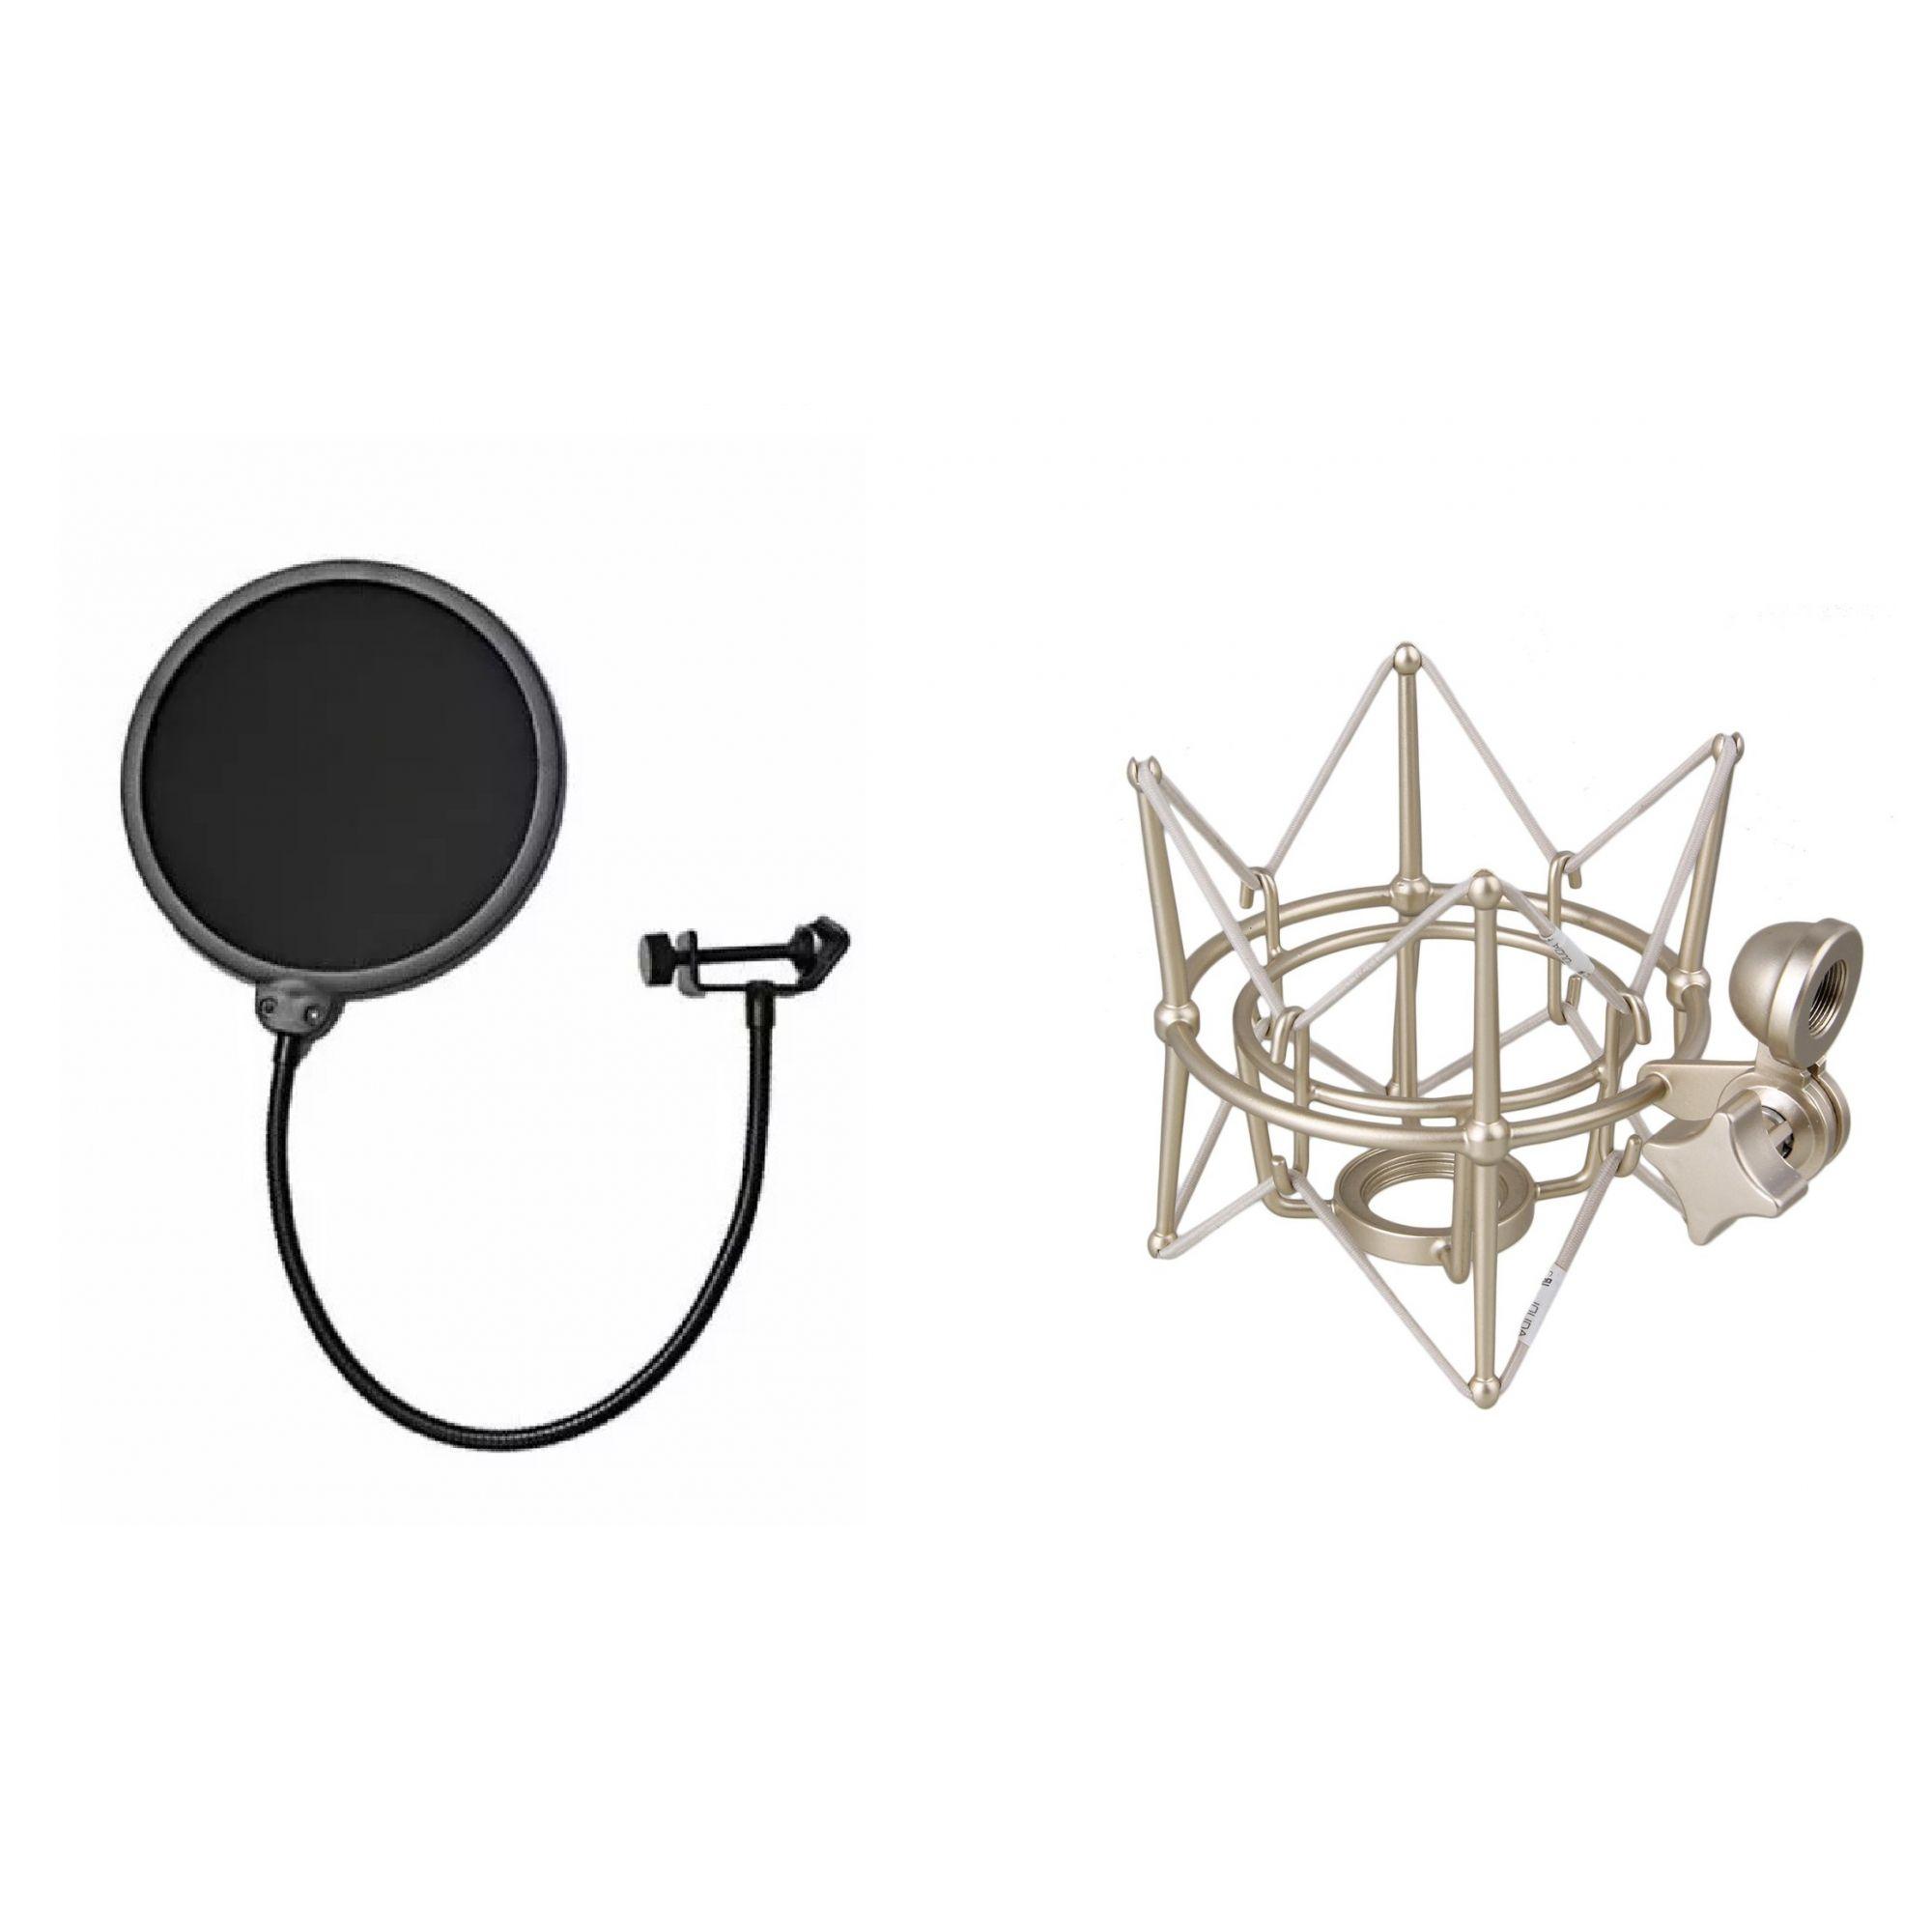 Kit Aranha Grande Prata + Pop Filter Microfone Condensador